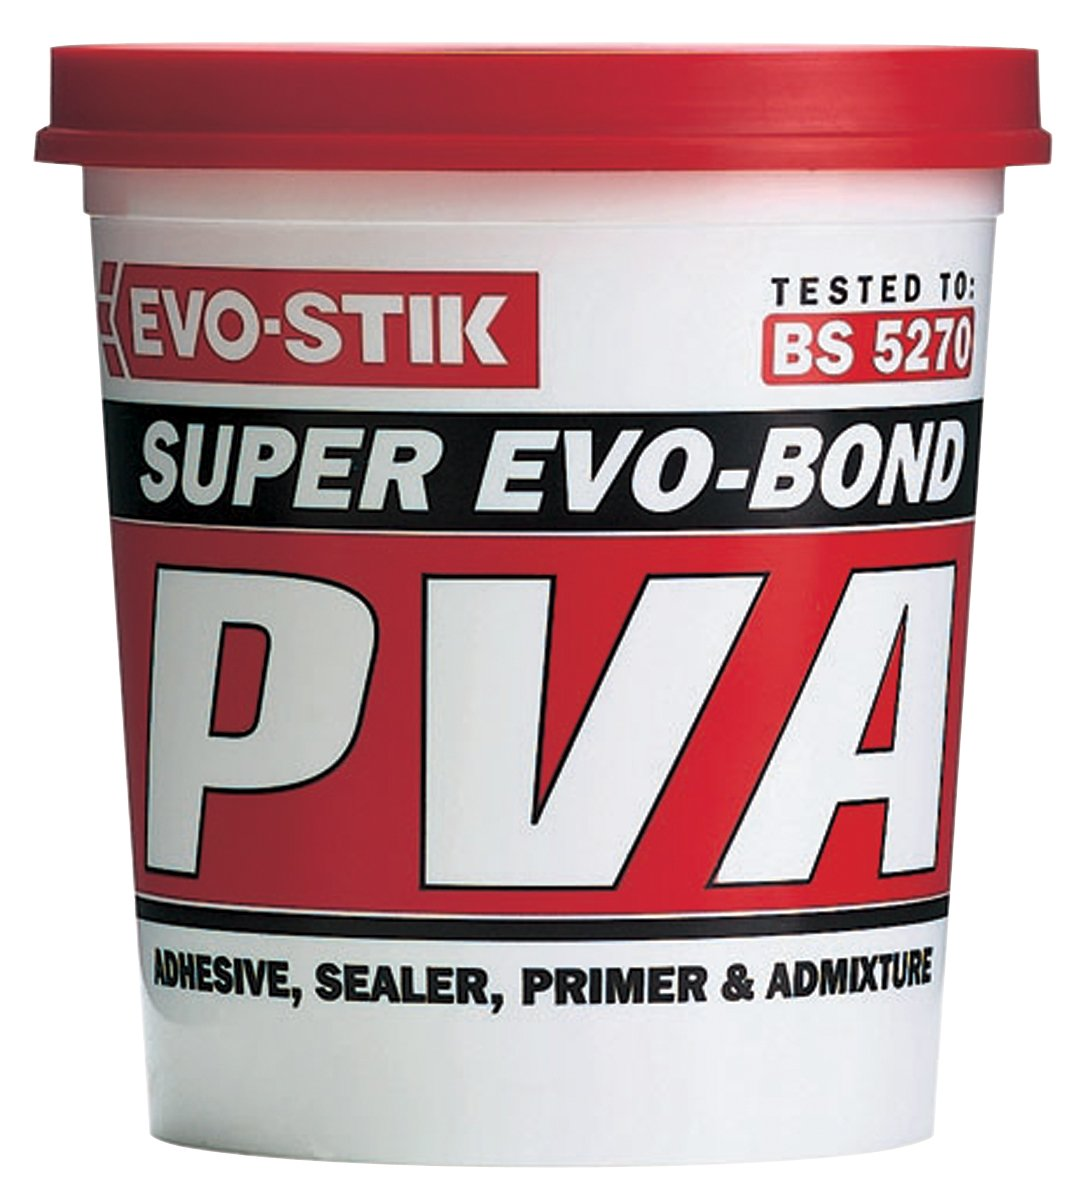 2 x 500ml Evo-Stik Super Evo-Bond PVA building adhesive sealer primer dustproofer admixture 122000